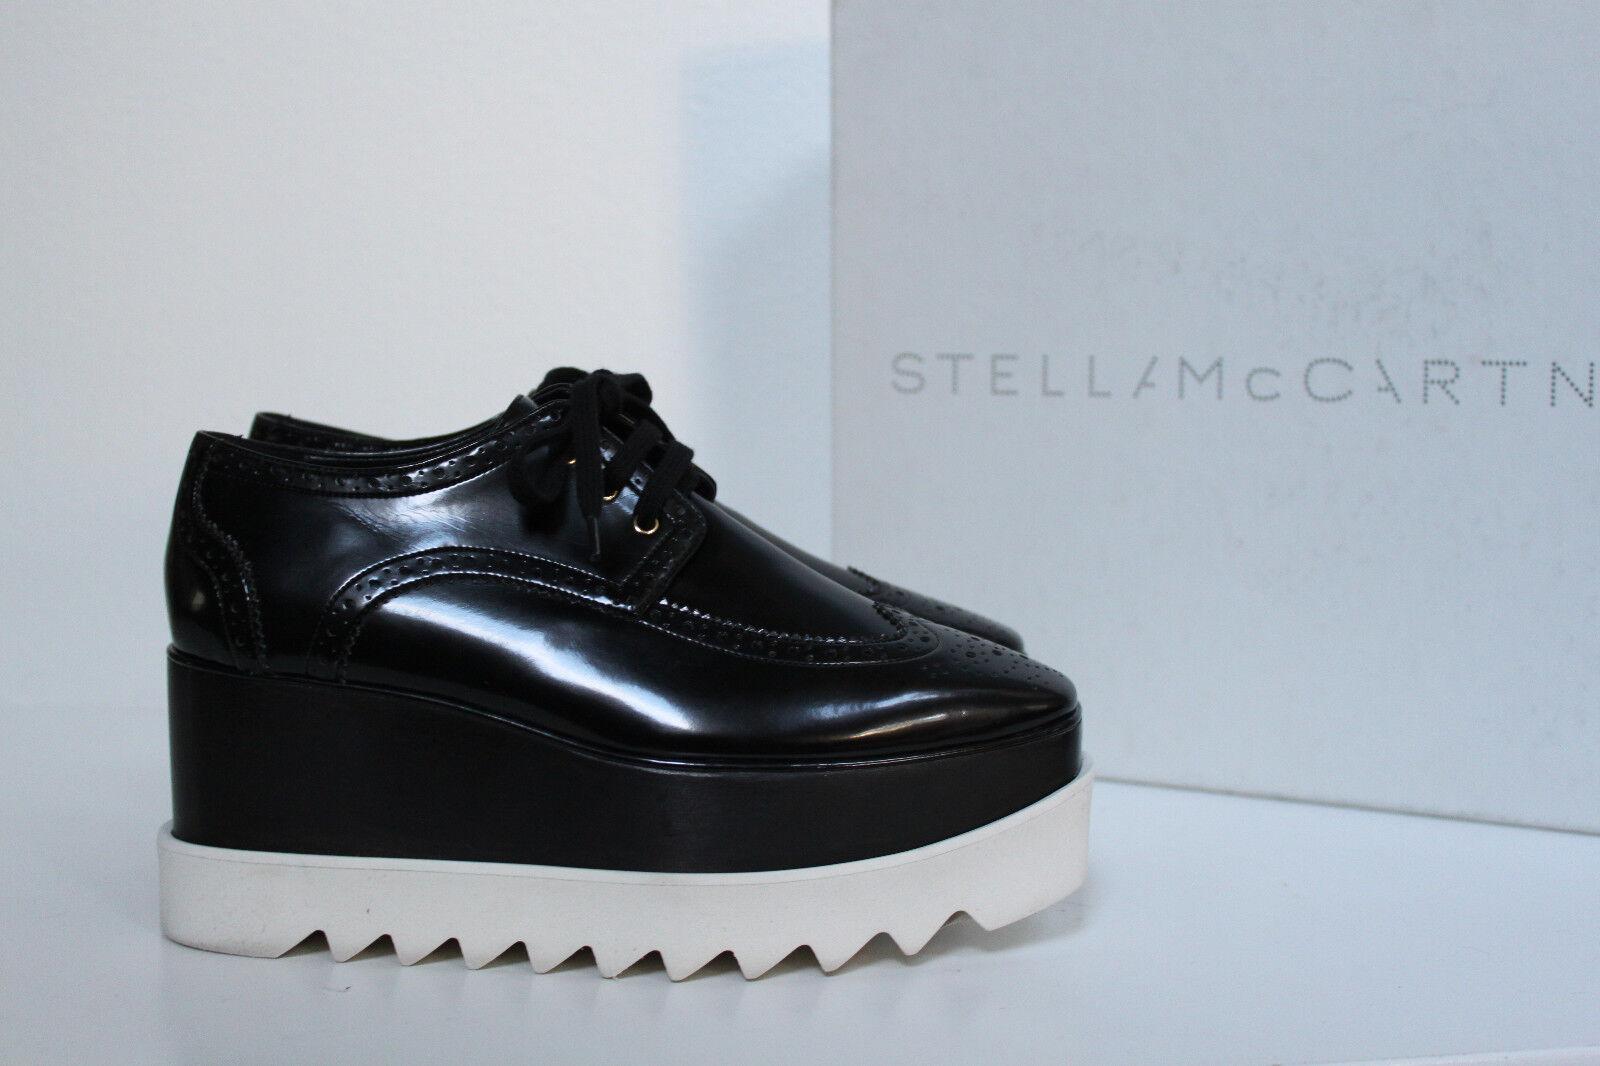 New sz 6   36.5 36.5 36.5 Stella Mccartney Scarpa Black Platform Wedge Heel Oxford shoes d910ec